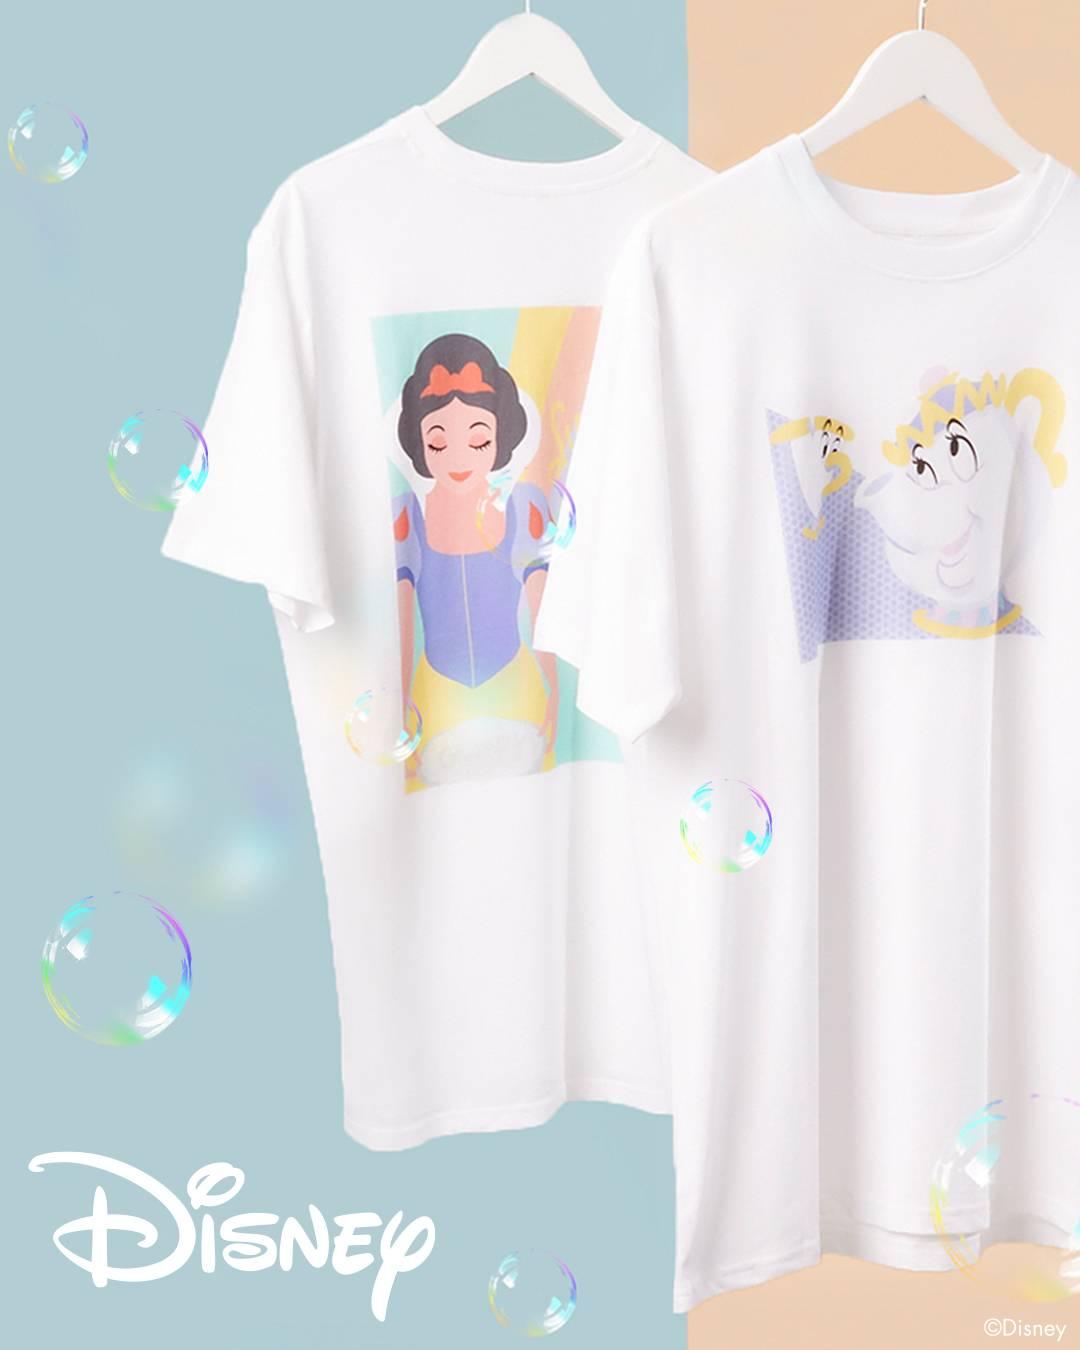 Disney Sidekicks collection new to VeryNeko